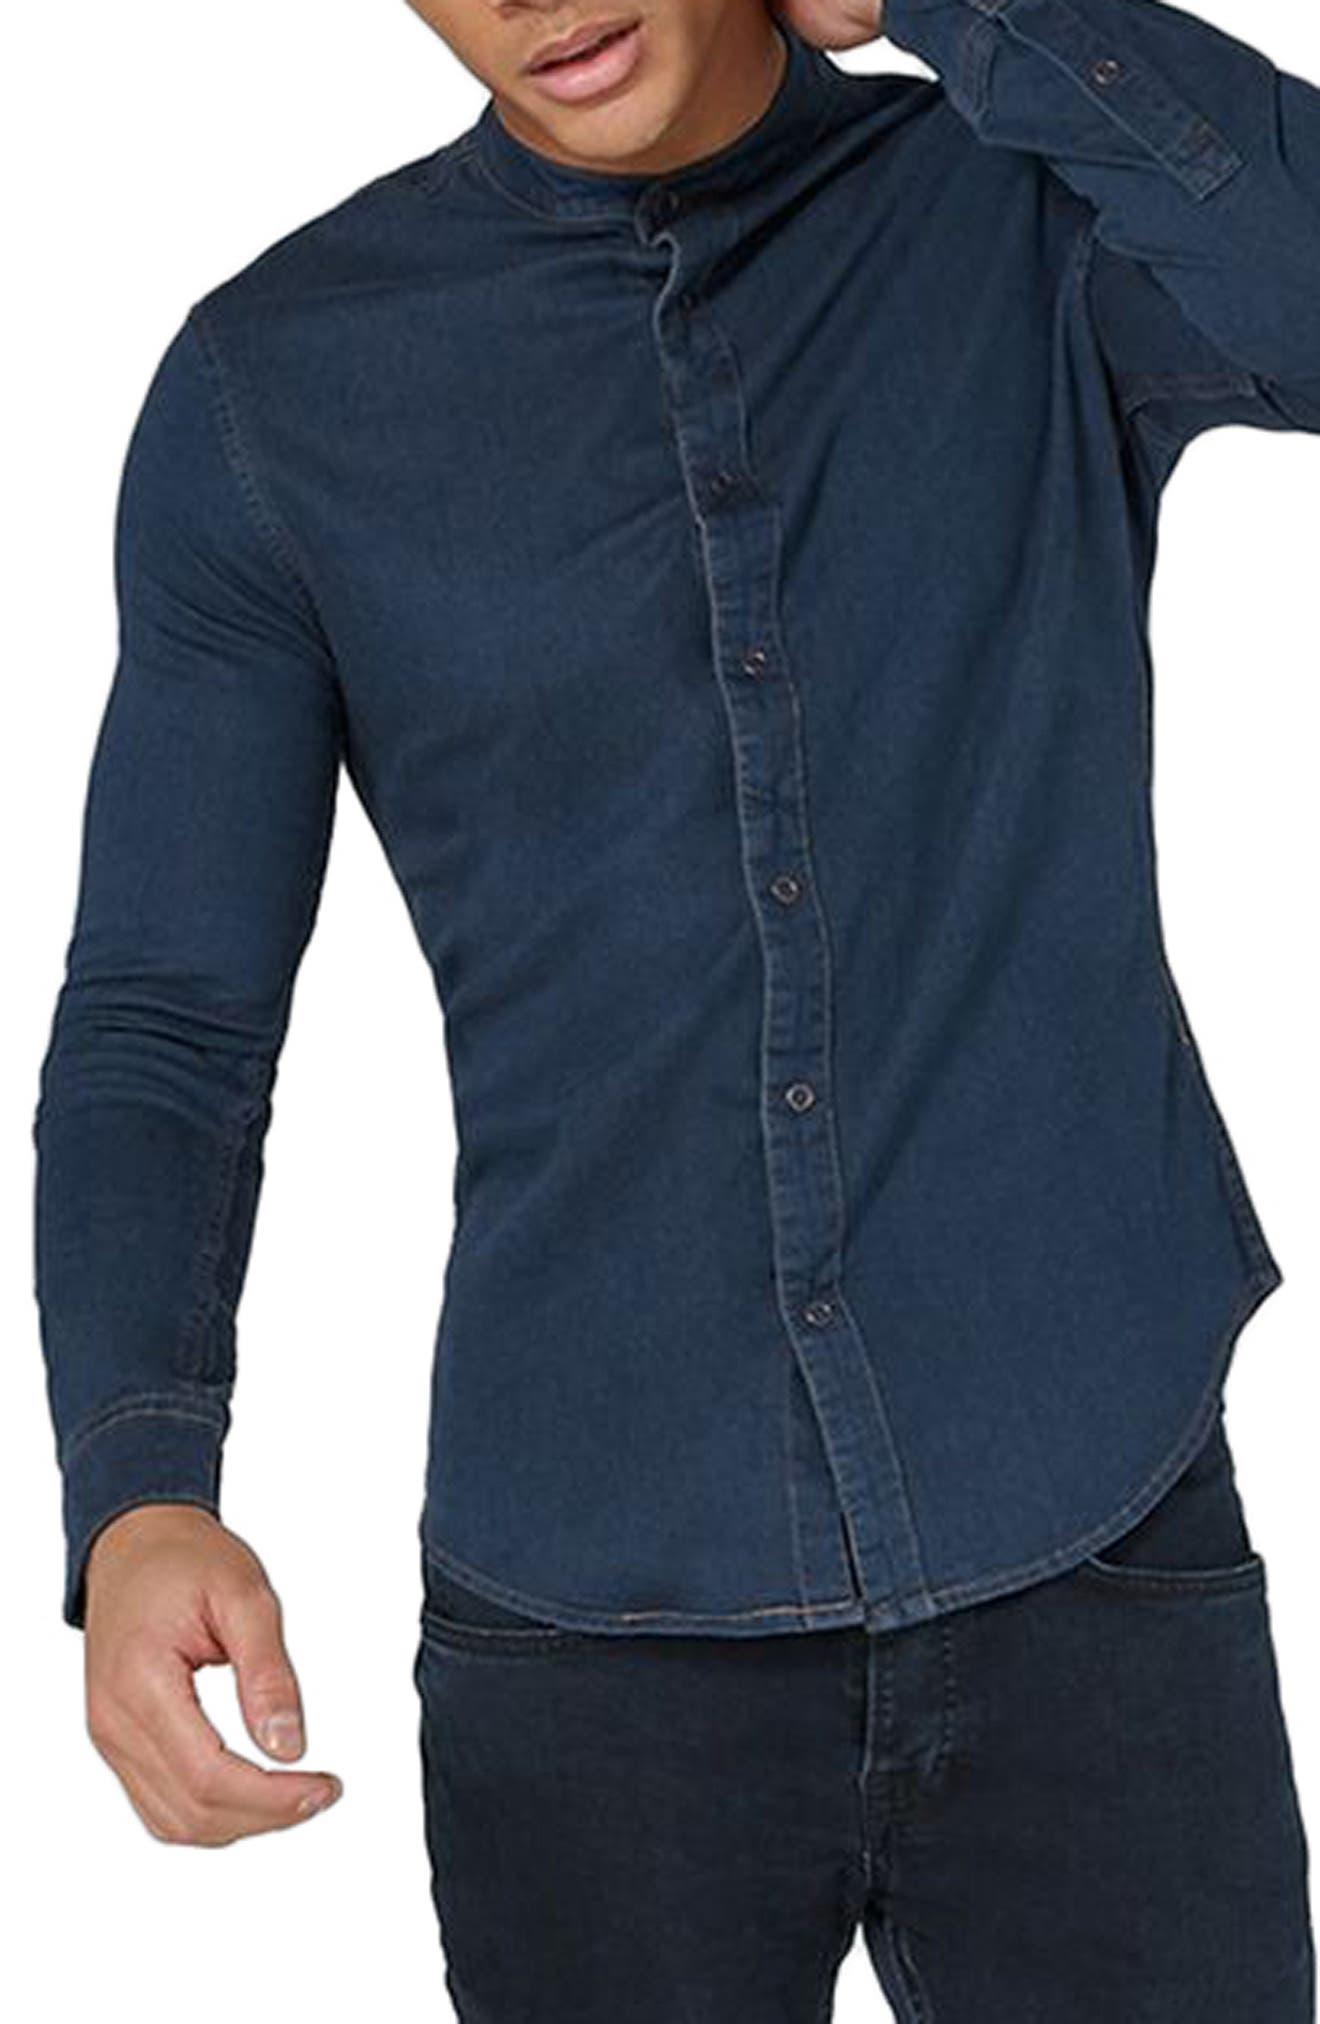 Band Collar Denim Shirt,                             Main thumbnail 1, color,                             Blue